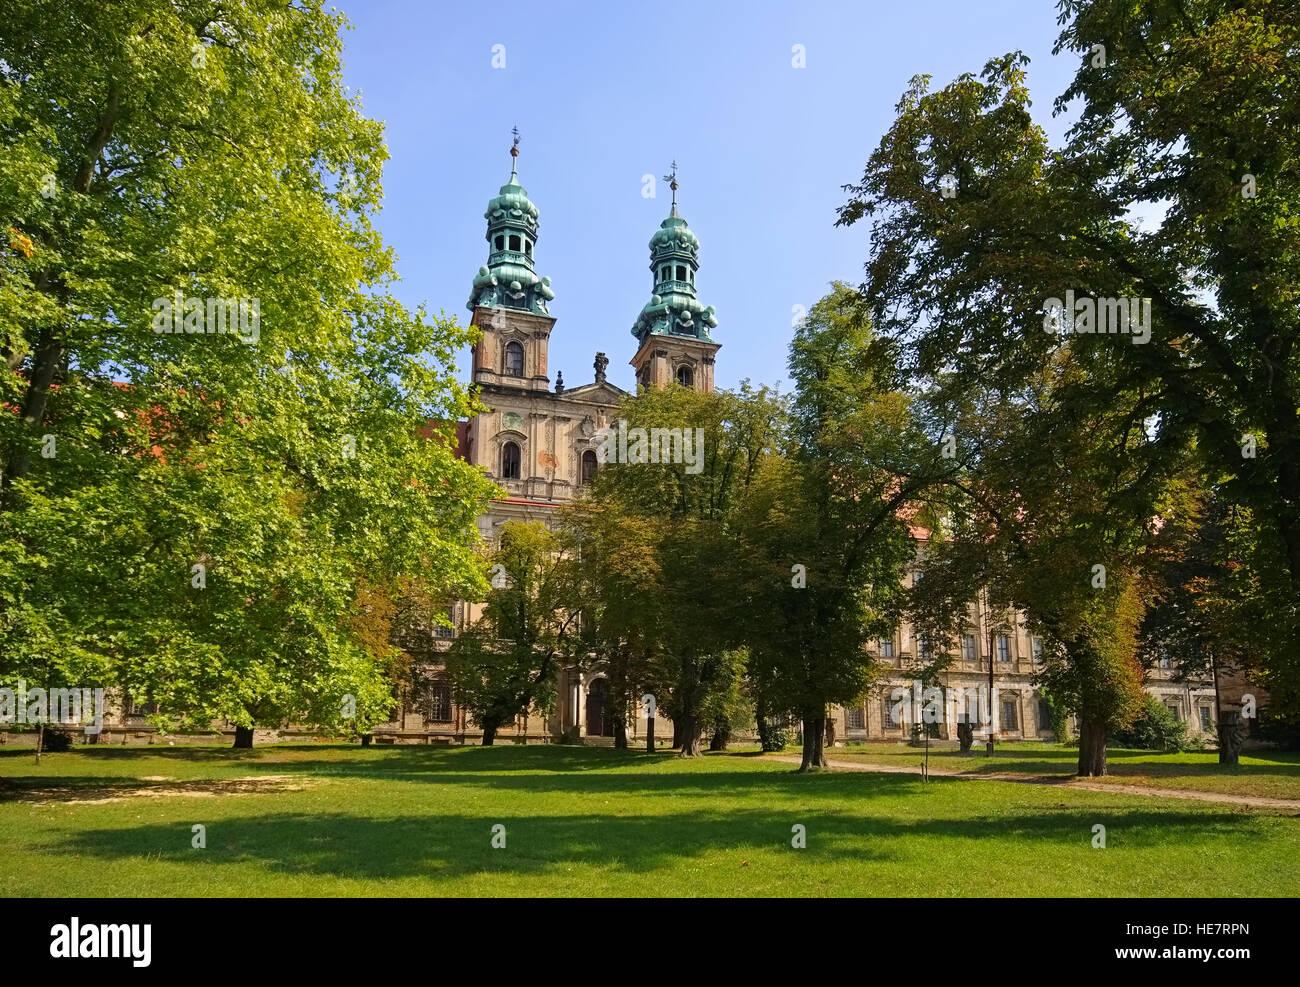 Leubus Kloster in Schlesien - Lubiaz Monastry barocco style in Lower Silesia, Poland Stock Photo